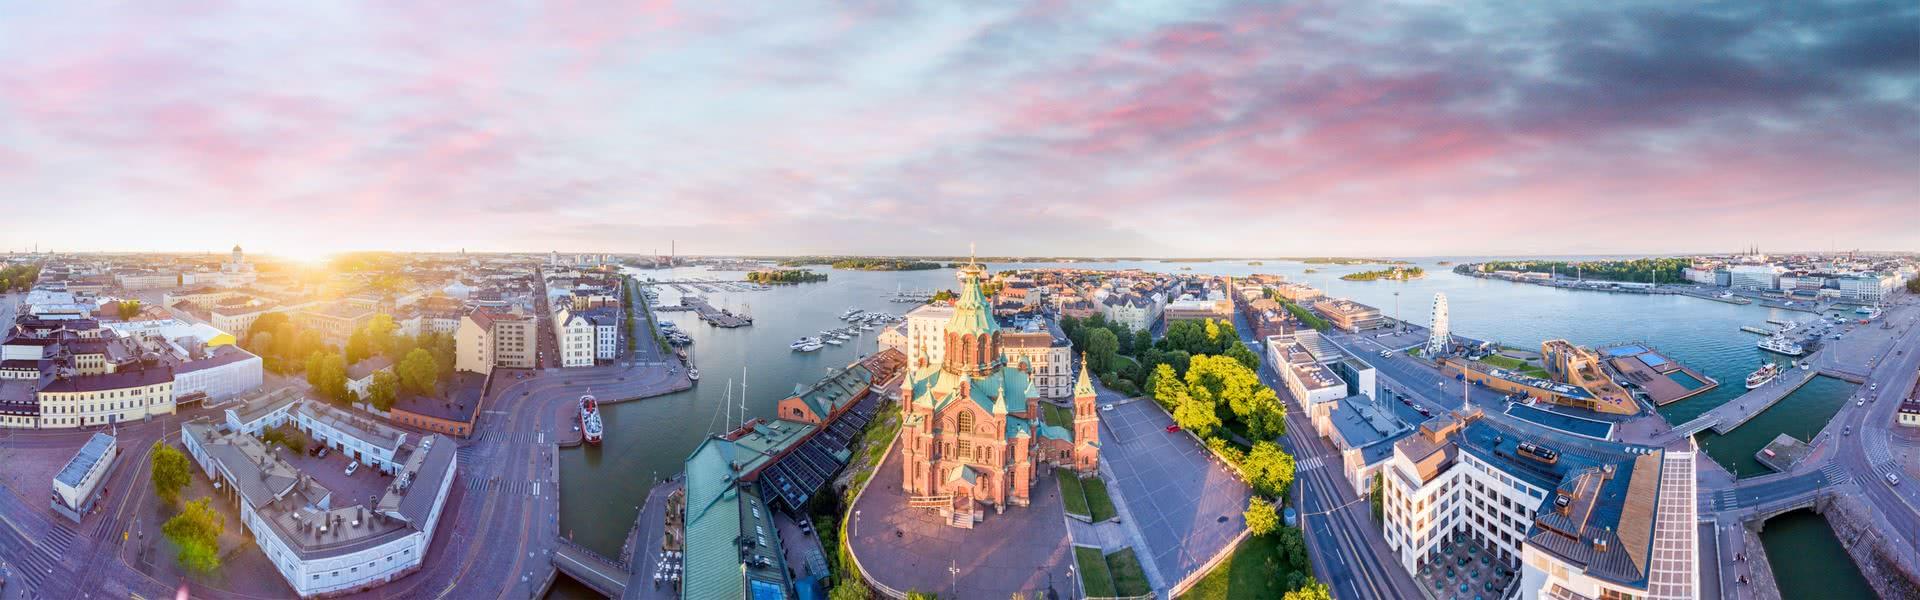 Titelbild von Helsinki